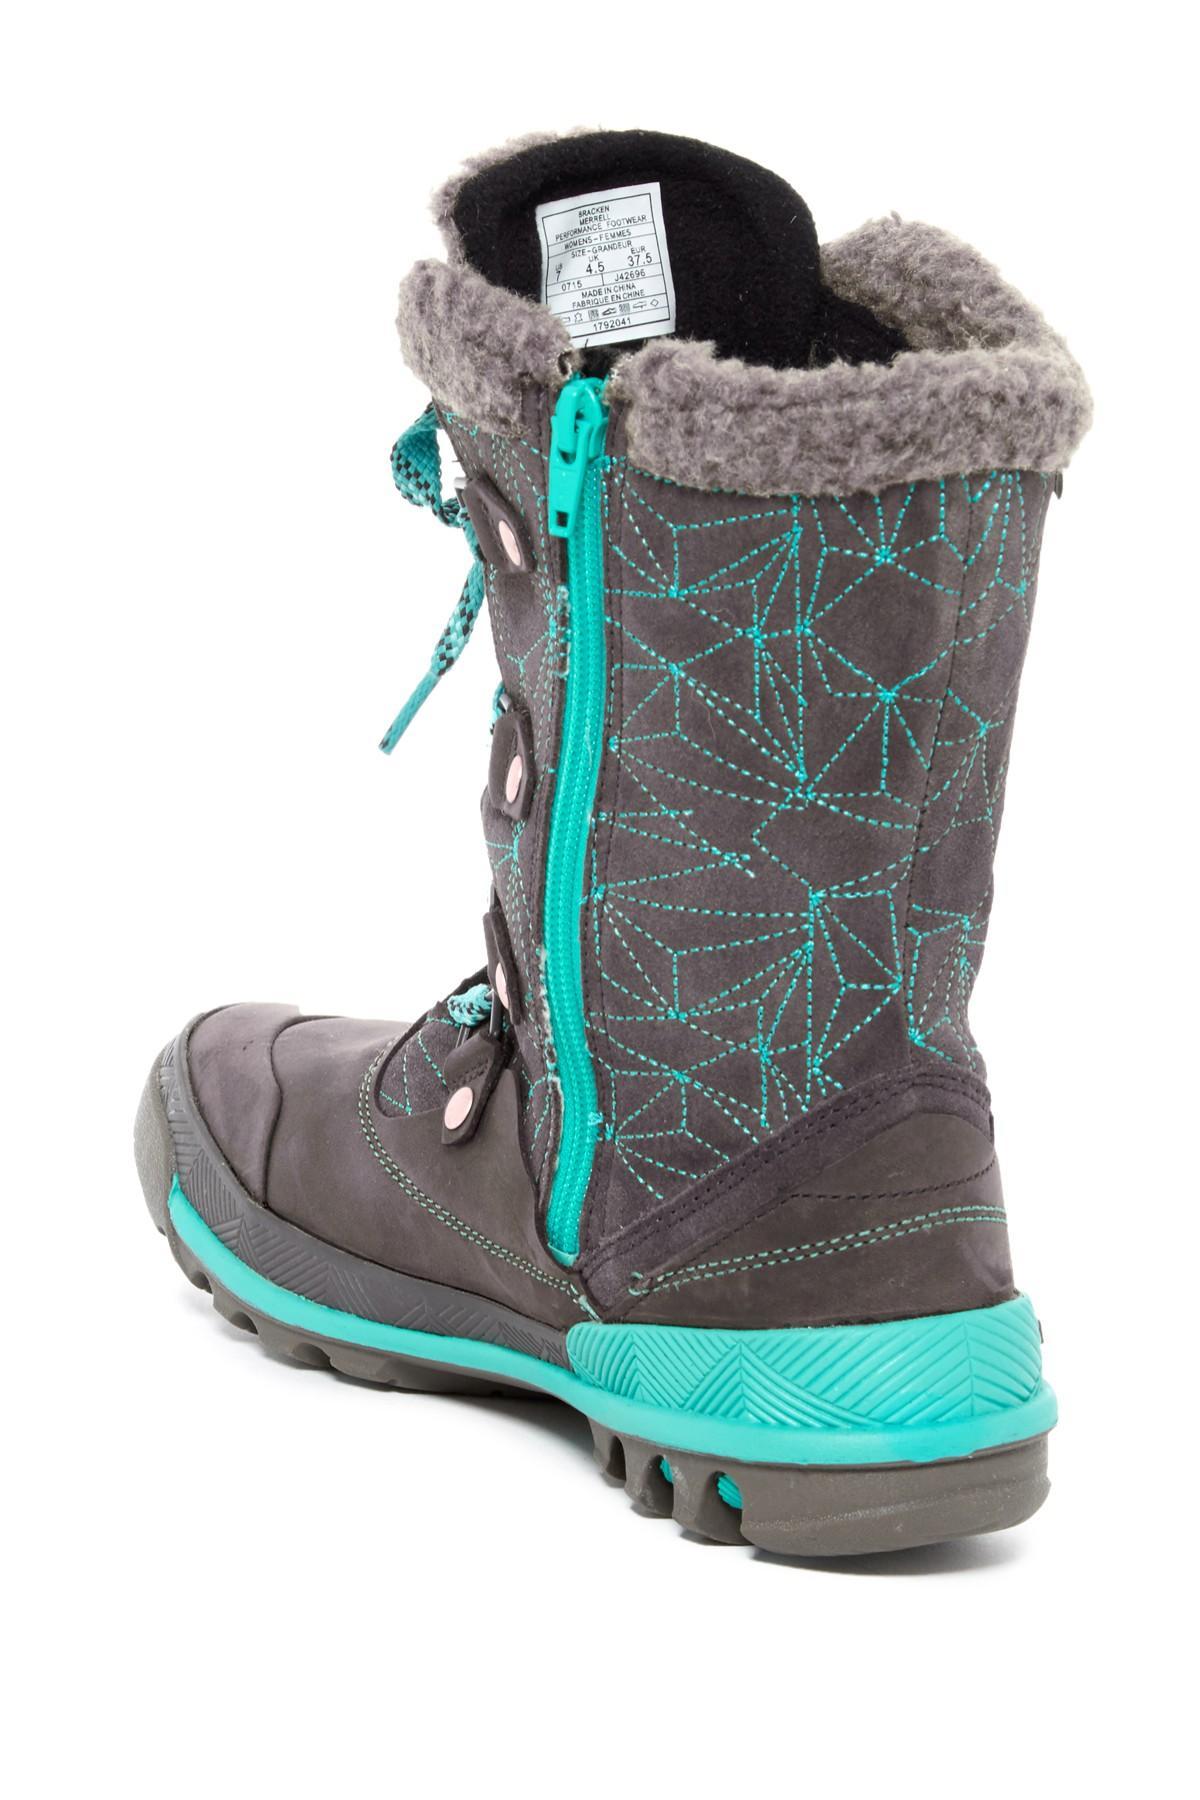 Lyst Merrell Silversun Lace Up Wool Trim Waterproof Boot